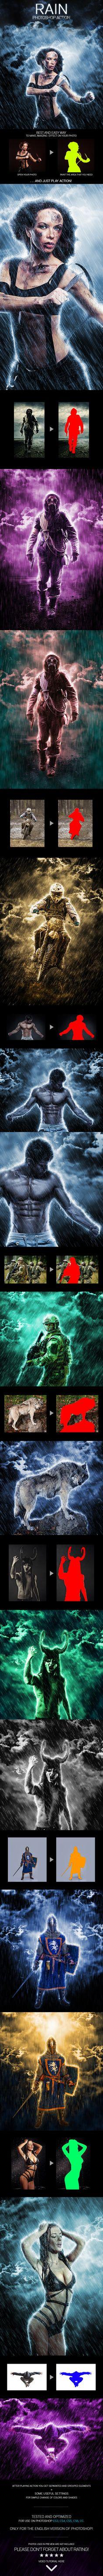 Rain Photoshop Action #photoeffect Download: http://graphicriver.net/item/rain-photoshop-action/11758895?ref=ksioks